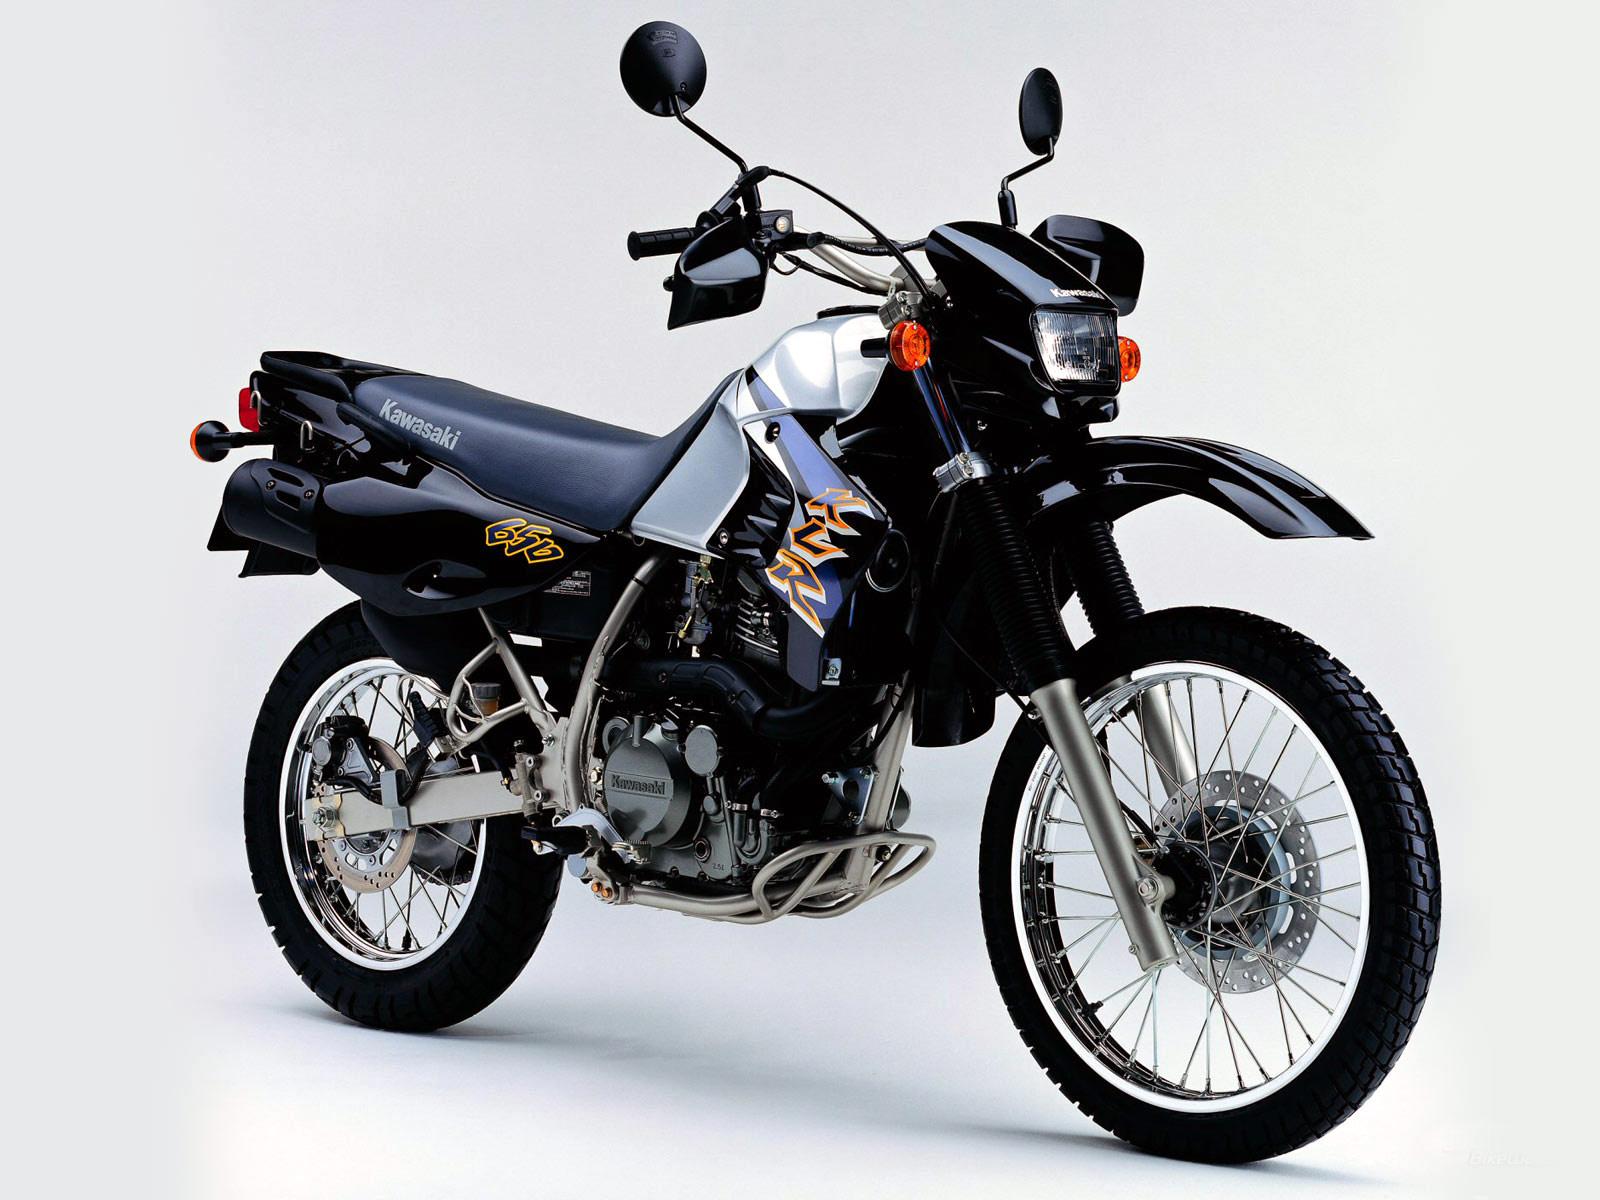 Kawasaki Motorcycles KLR 650 Download Wallpaper Save Your 1600x1200